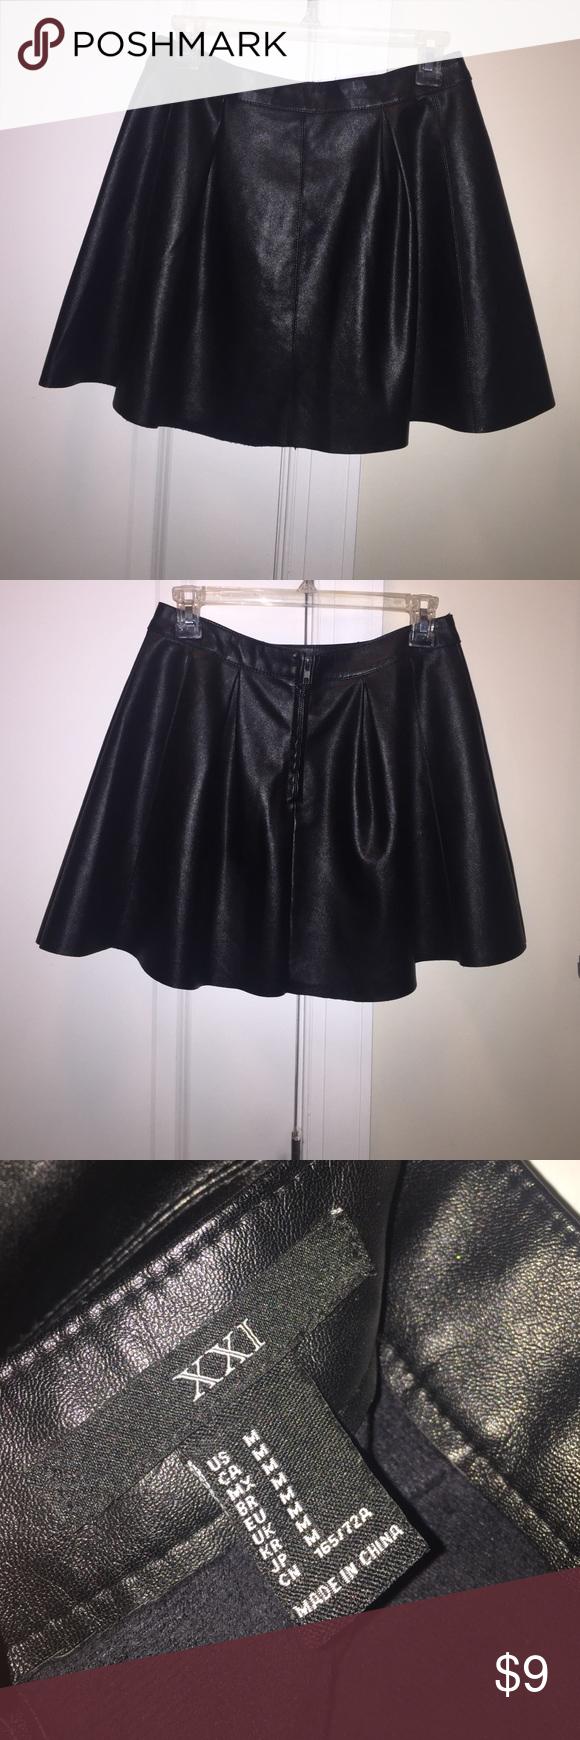 Forever21 - Faux Leather Skater Skirt, Size Medium Like New, perfect condition skater skirt! Zipper back. A definite MUST HAVE for Fall/Winter! Forever 21 Skirts Circle & Skater